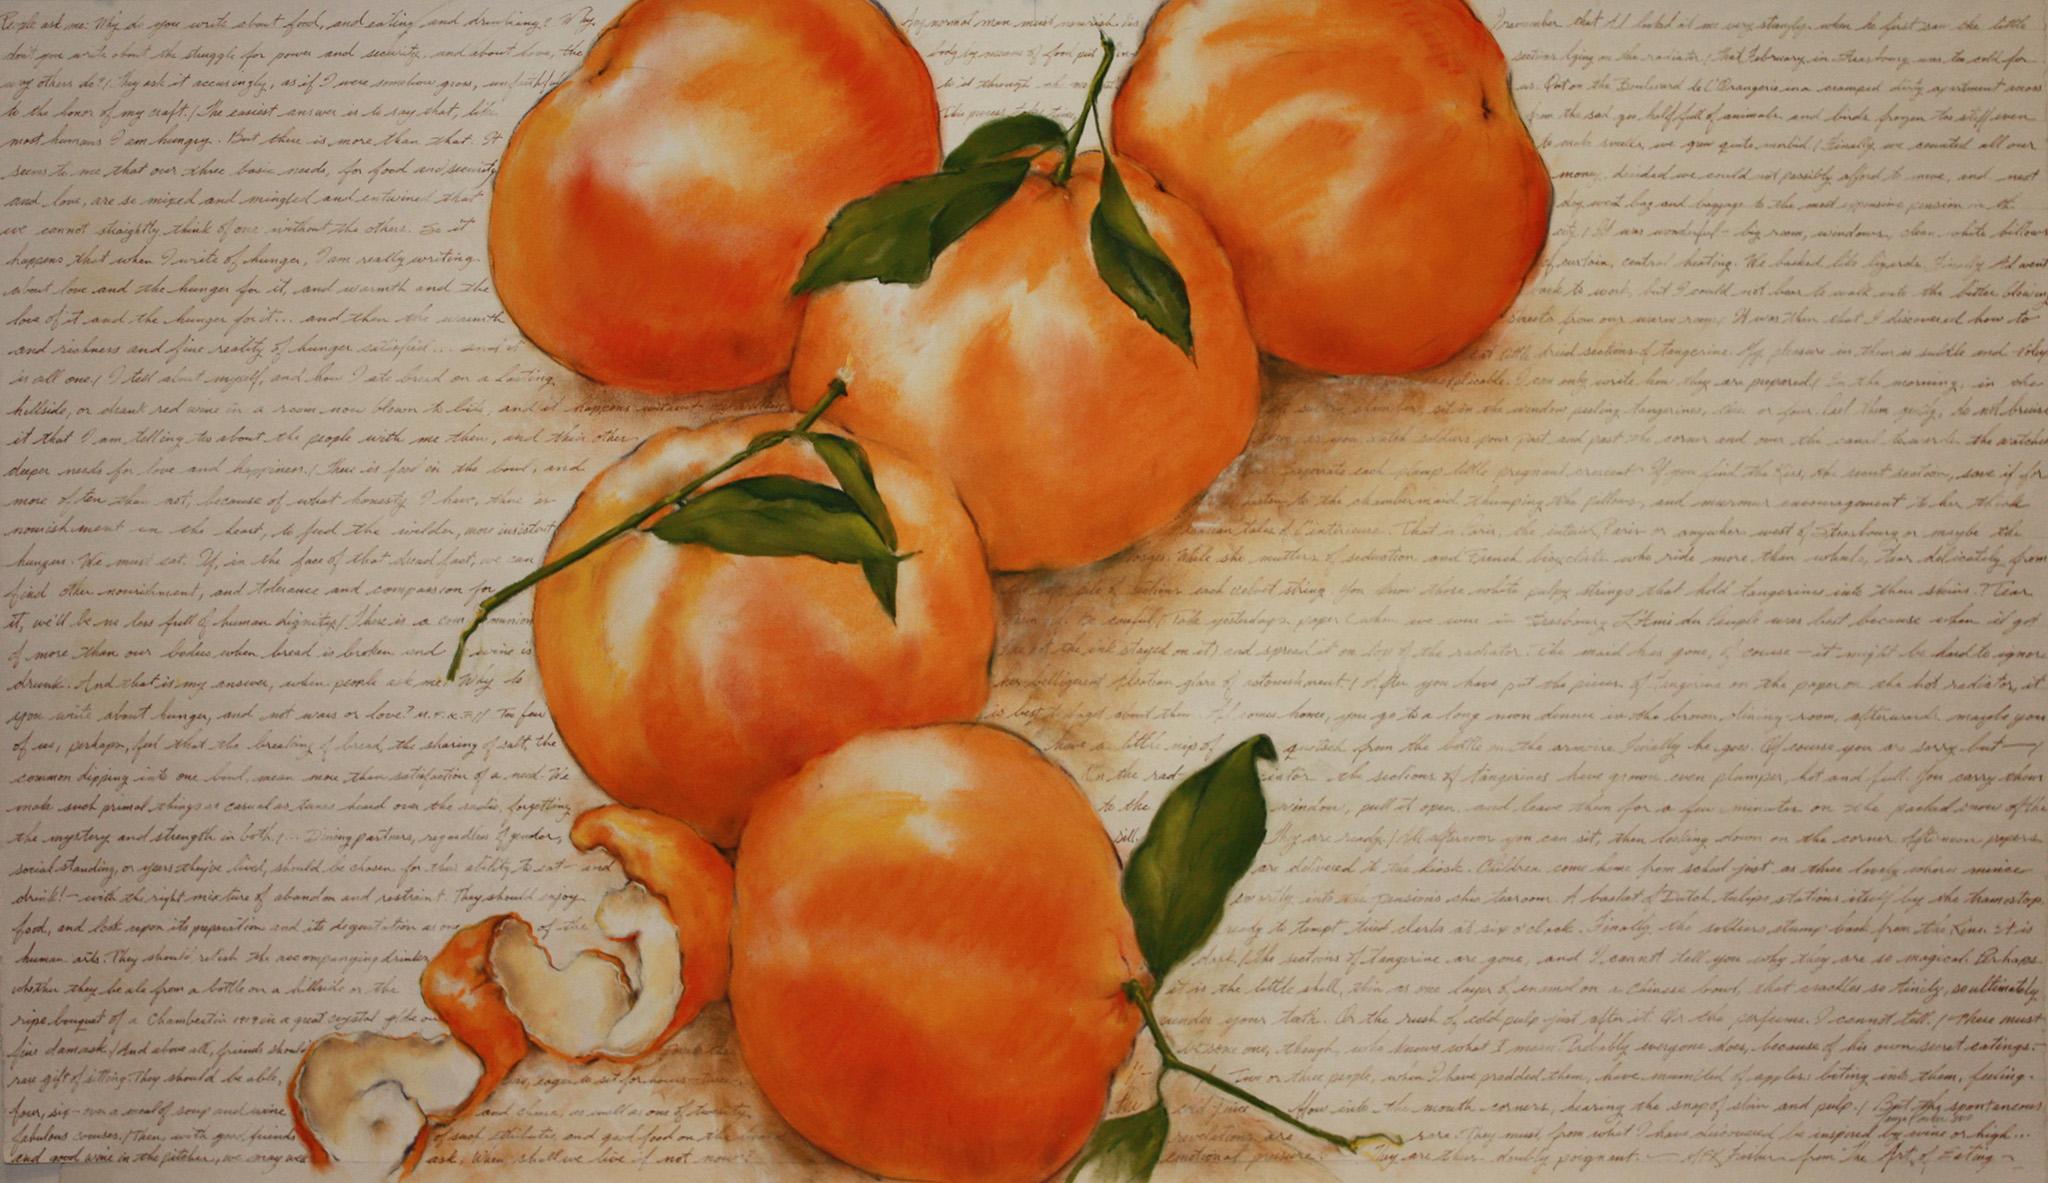 Tangerines for Anne